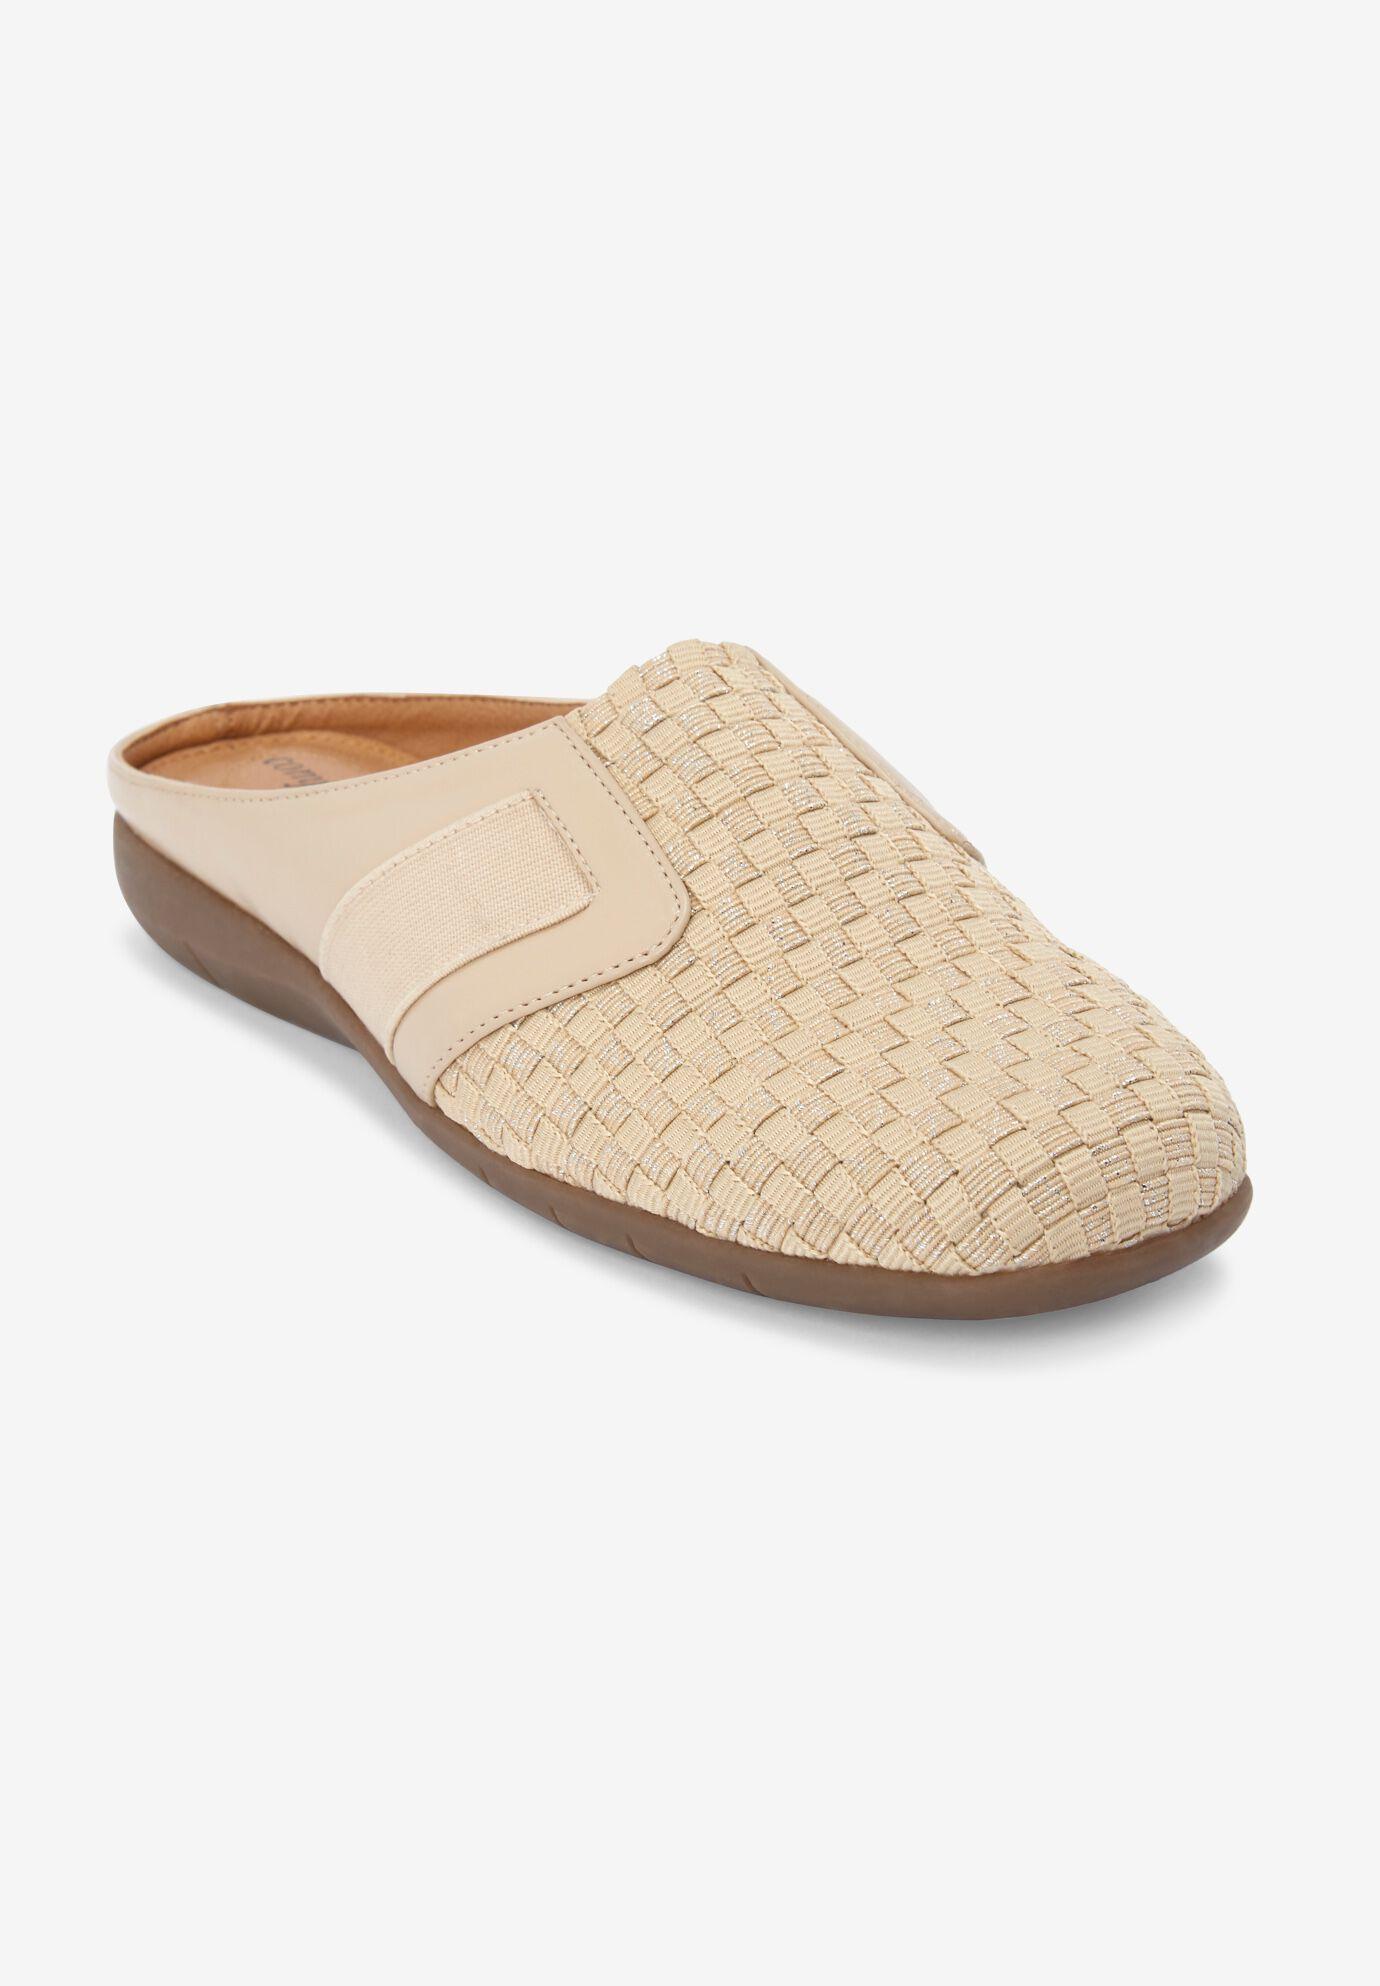 Wide Width Slides \u0026 Mules for Women